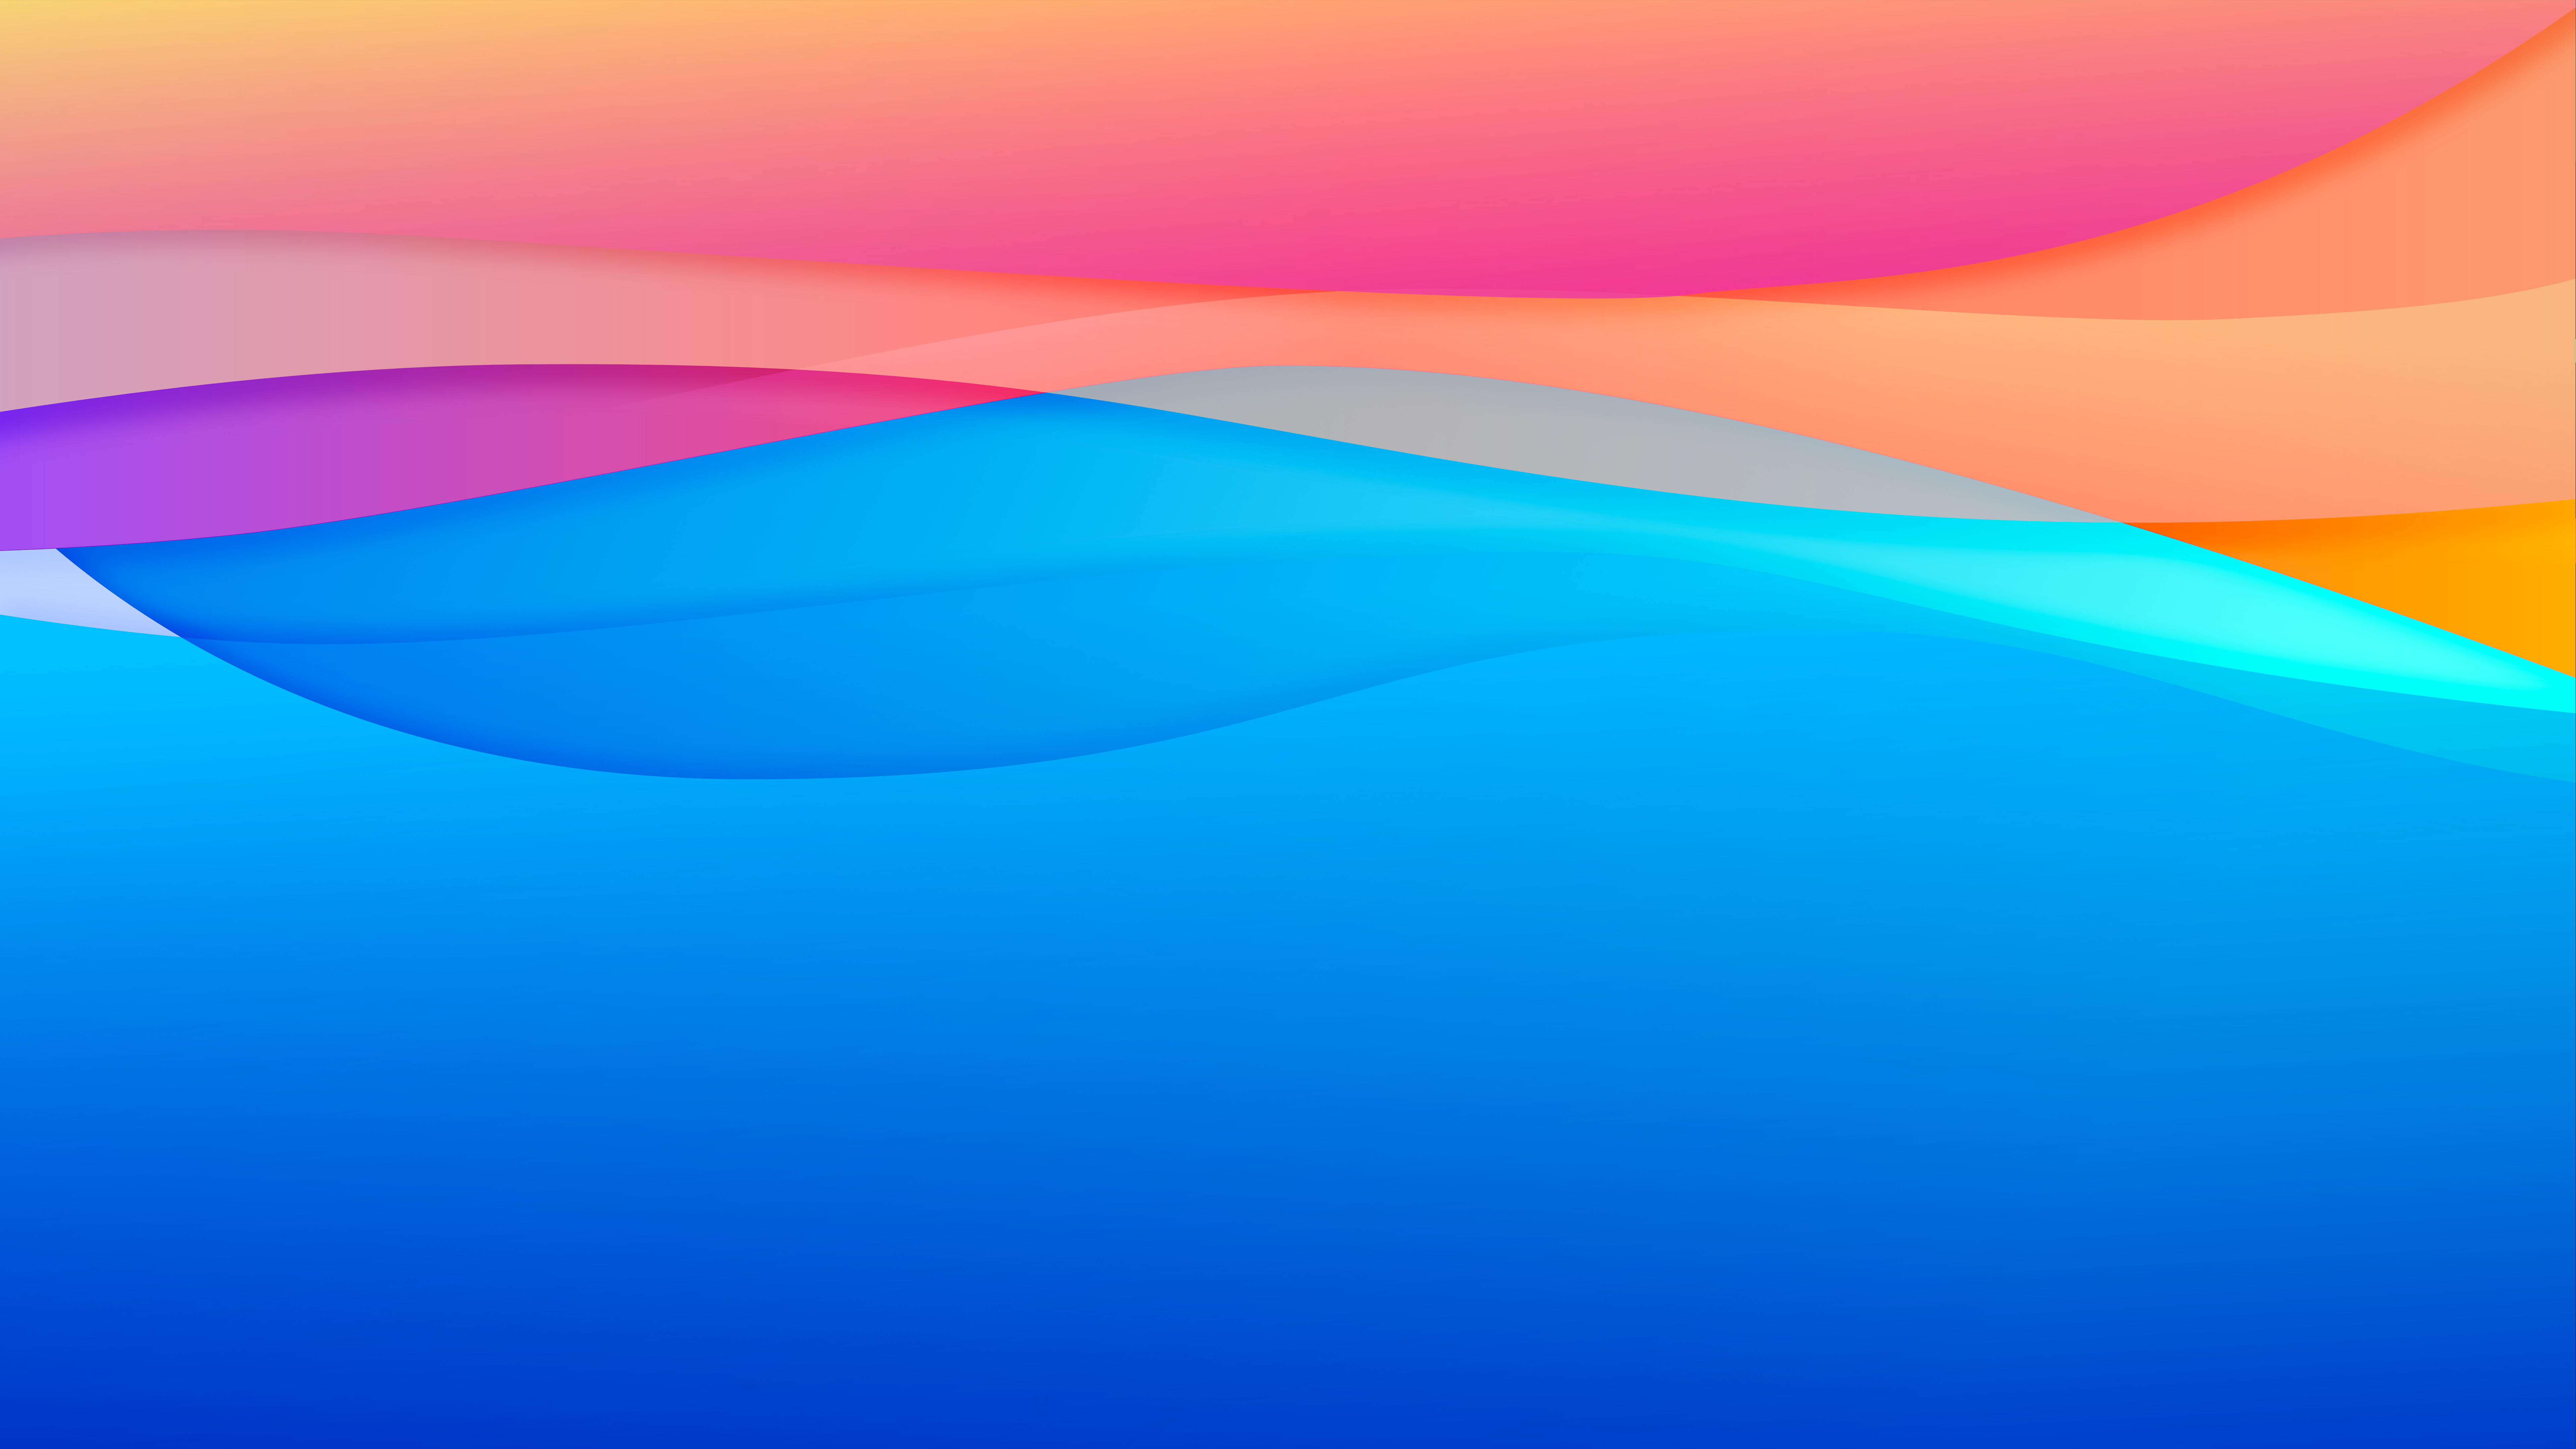 big sur 4k 1608576704 - Big Sur 4k - Big Sur 4k wallpapers